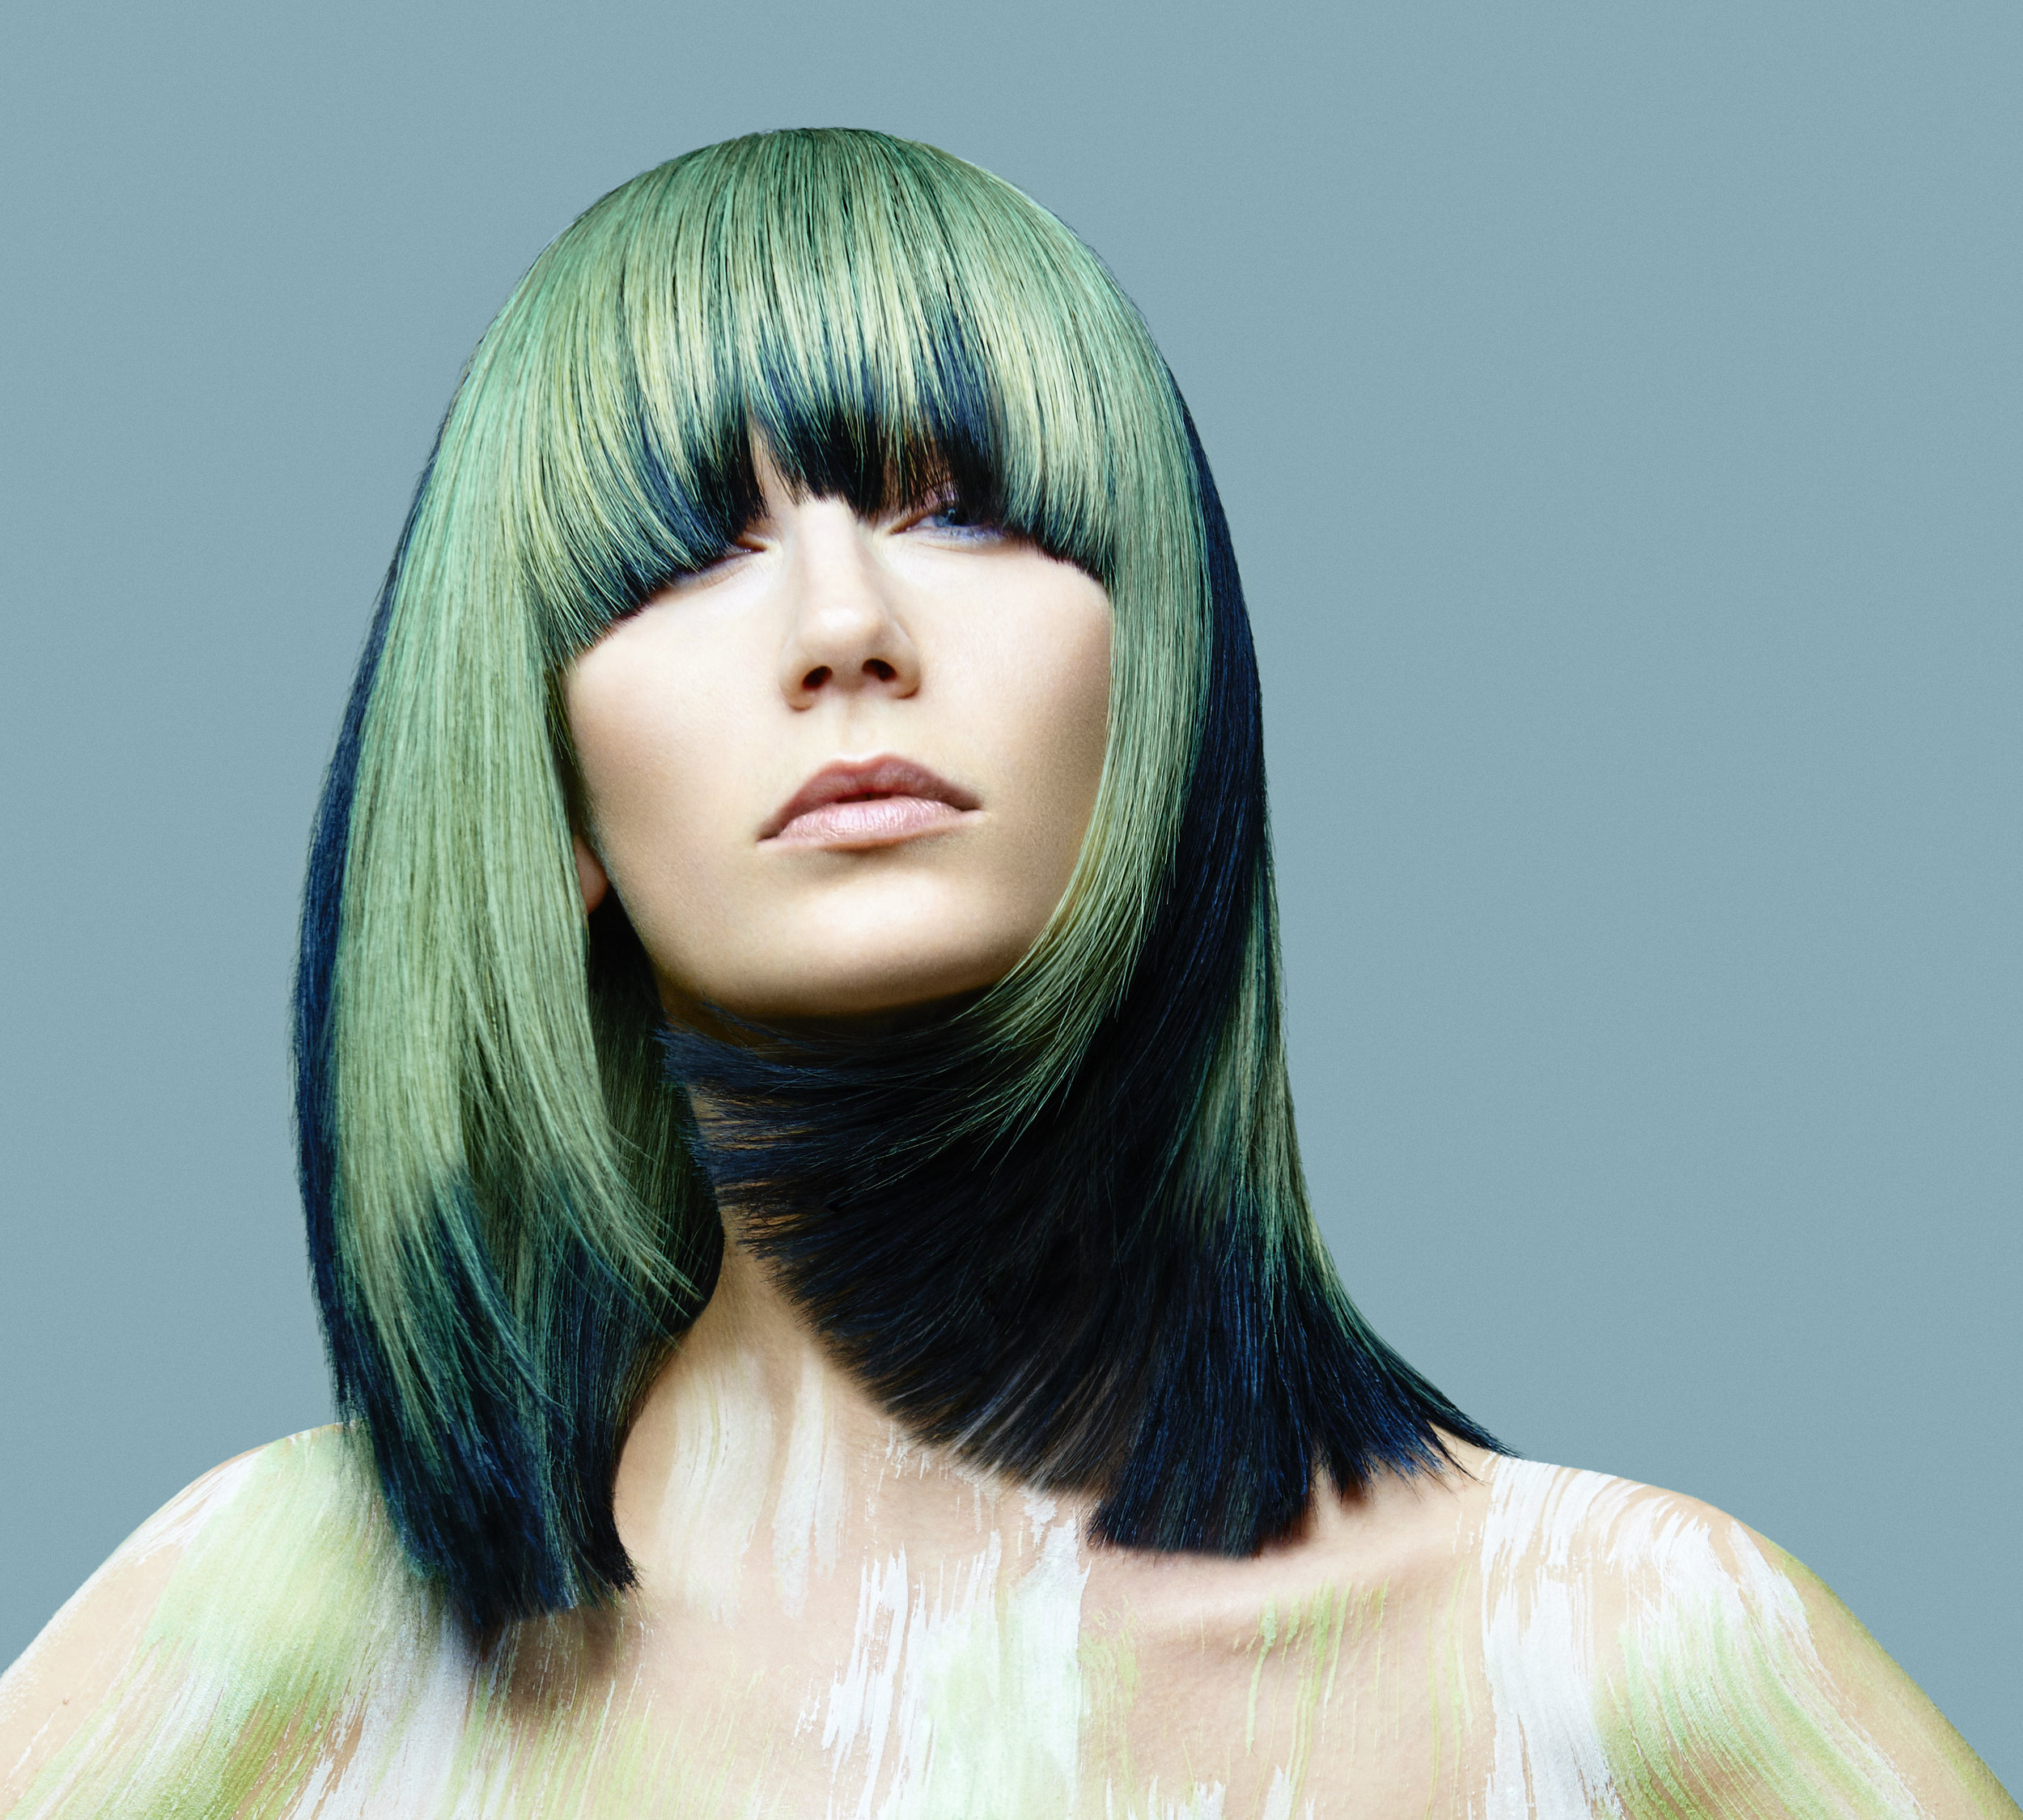 Color -  Lupe Voss  Art Direction -  Allen Ruiz  Style -  Allen Ruiz  Make-Up - Anastasia Durasova  Photo -  Manuel Voss